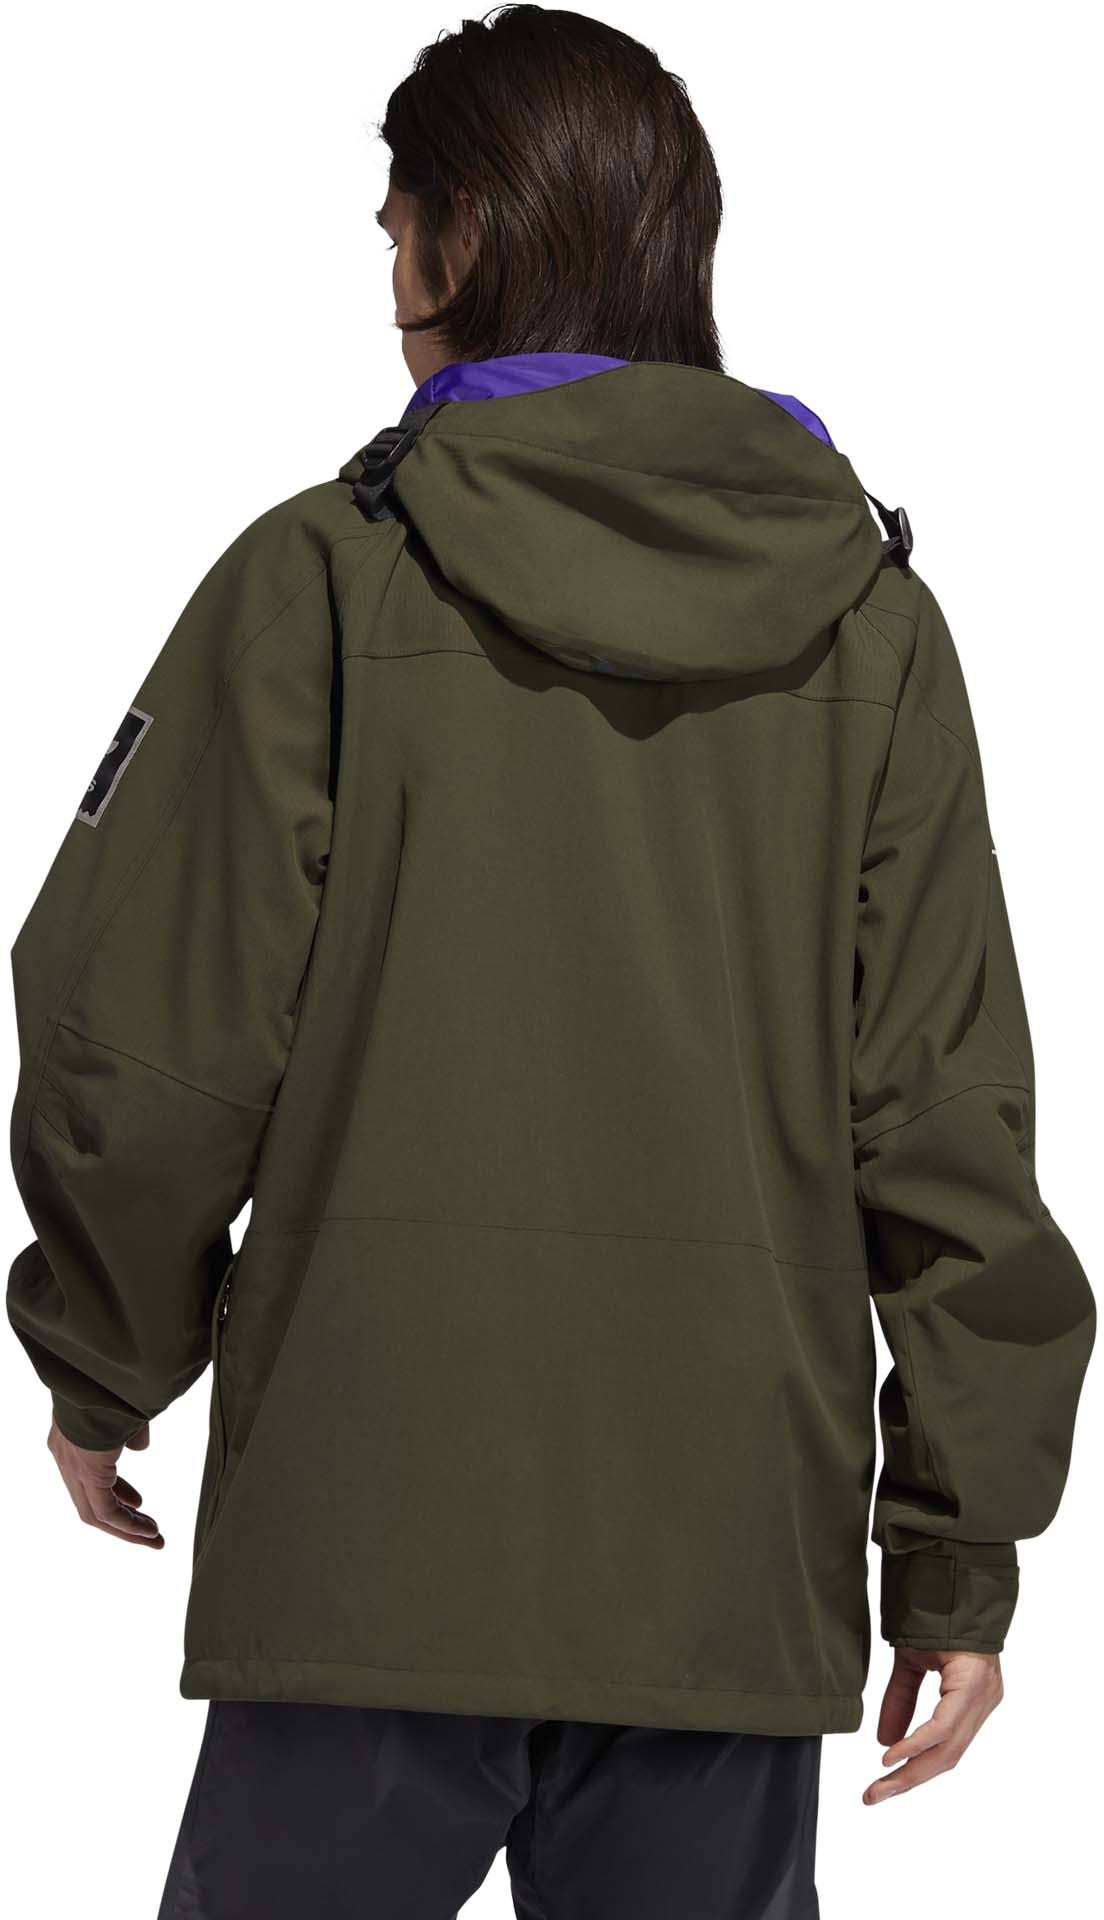 Adidas Utility Jacket (Night Cargo/Collegiate Purple,M)